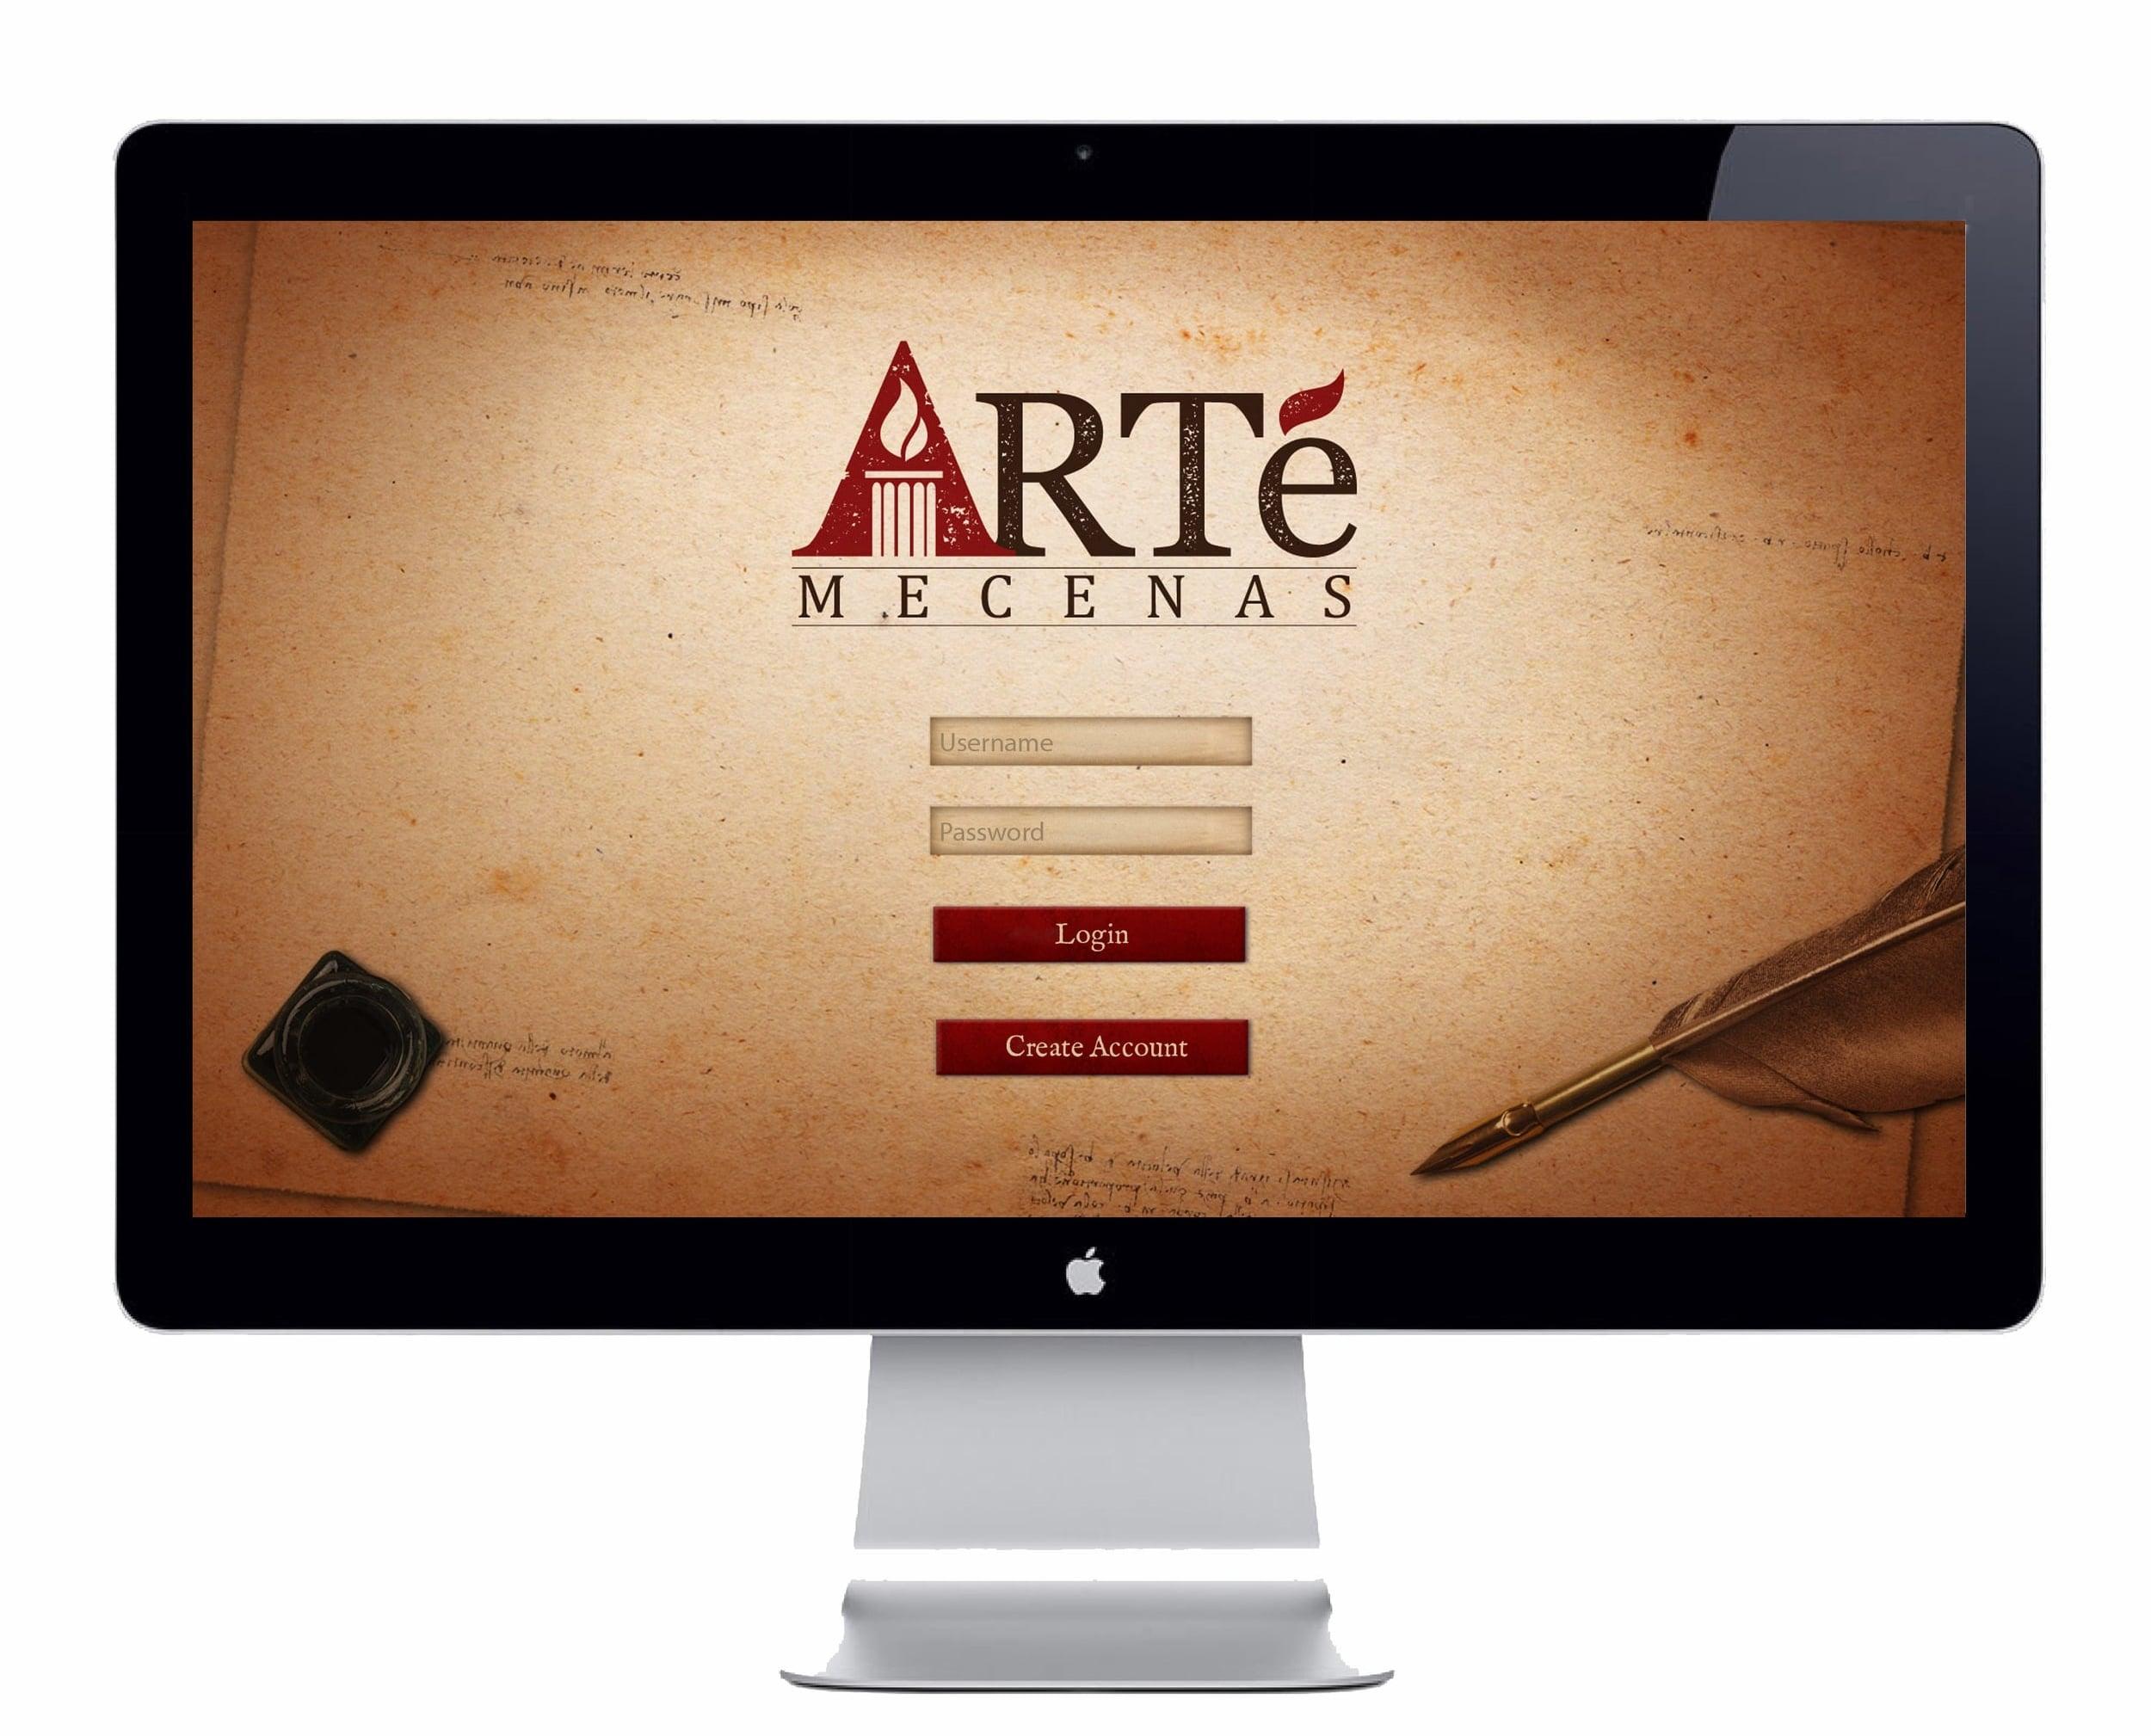 Arté: Mecenas Desktop Login Screen